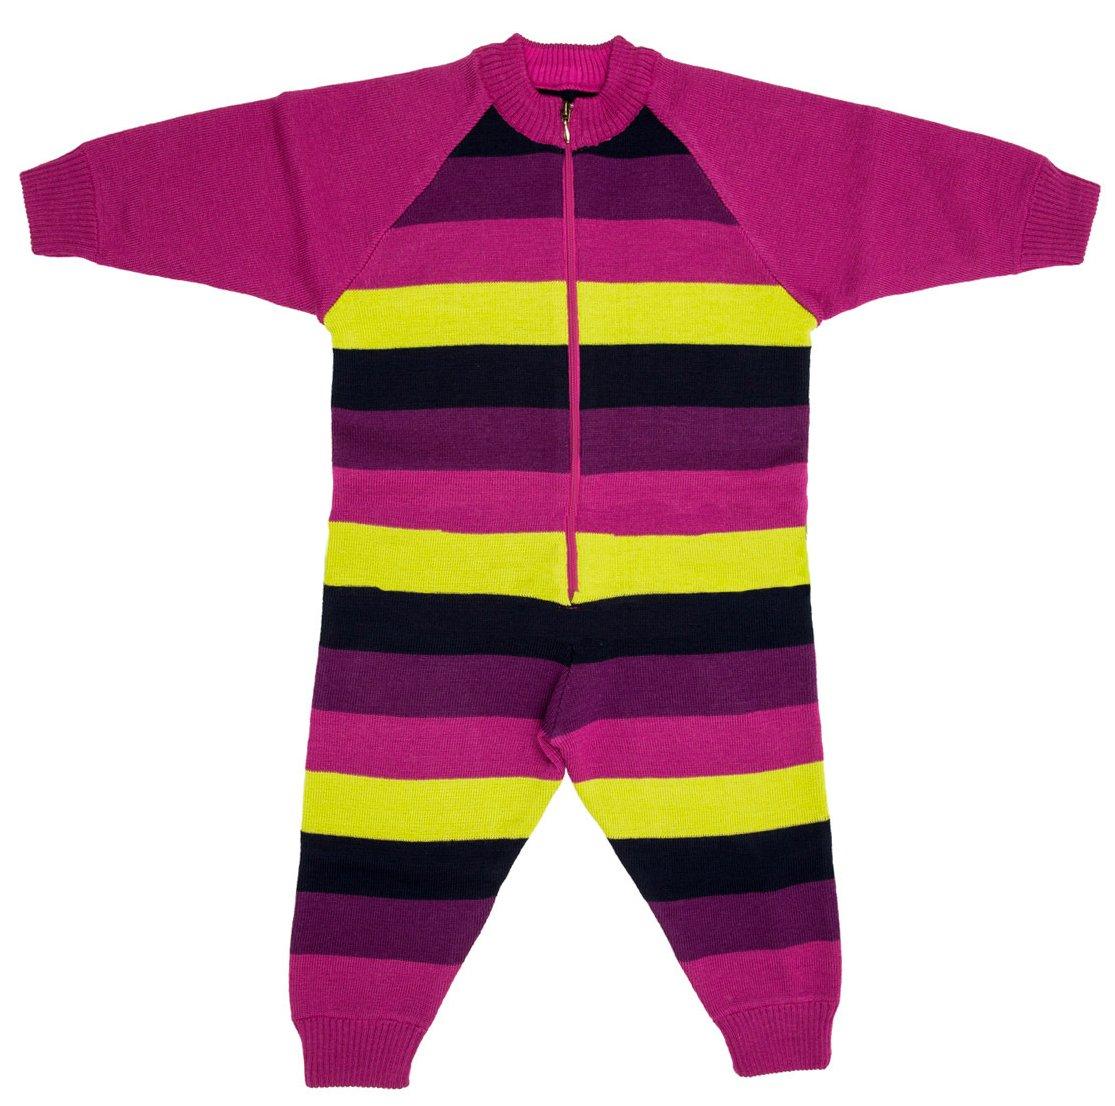 Lenne'15 Wool Overall Rafe 14584-15584/271 Bērnu silts vilnas kombinezons uzsvārcis krāsa:271